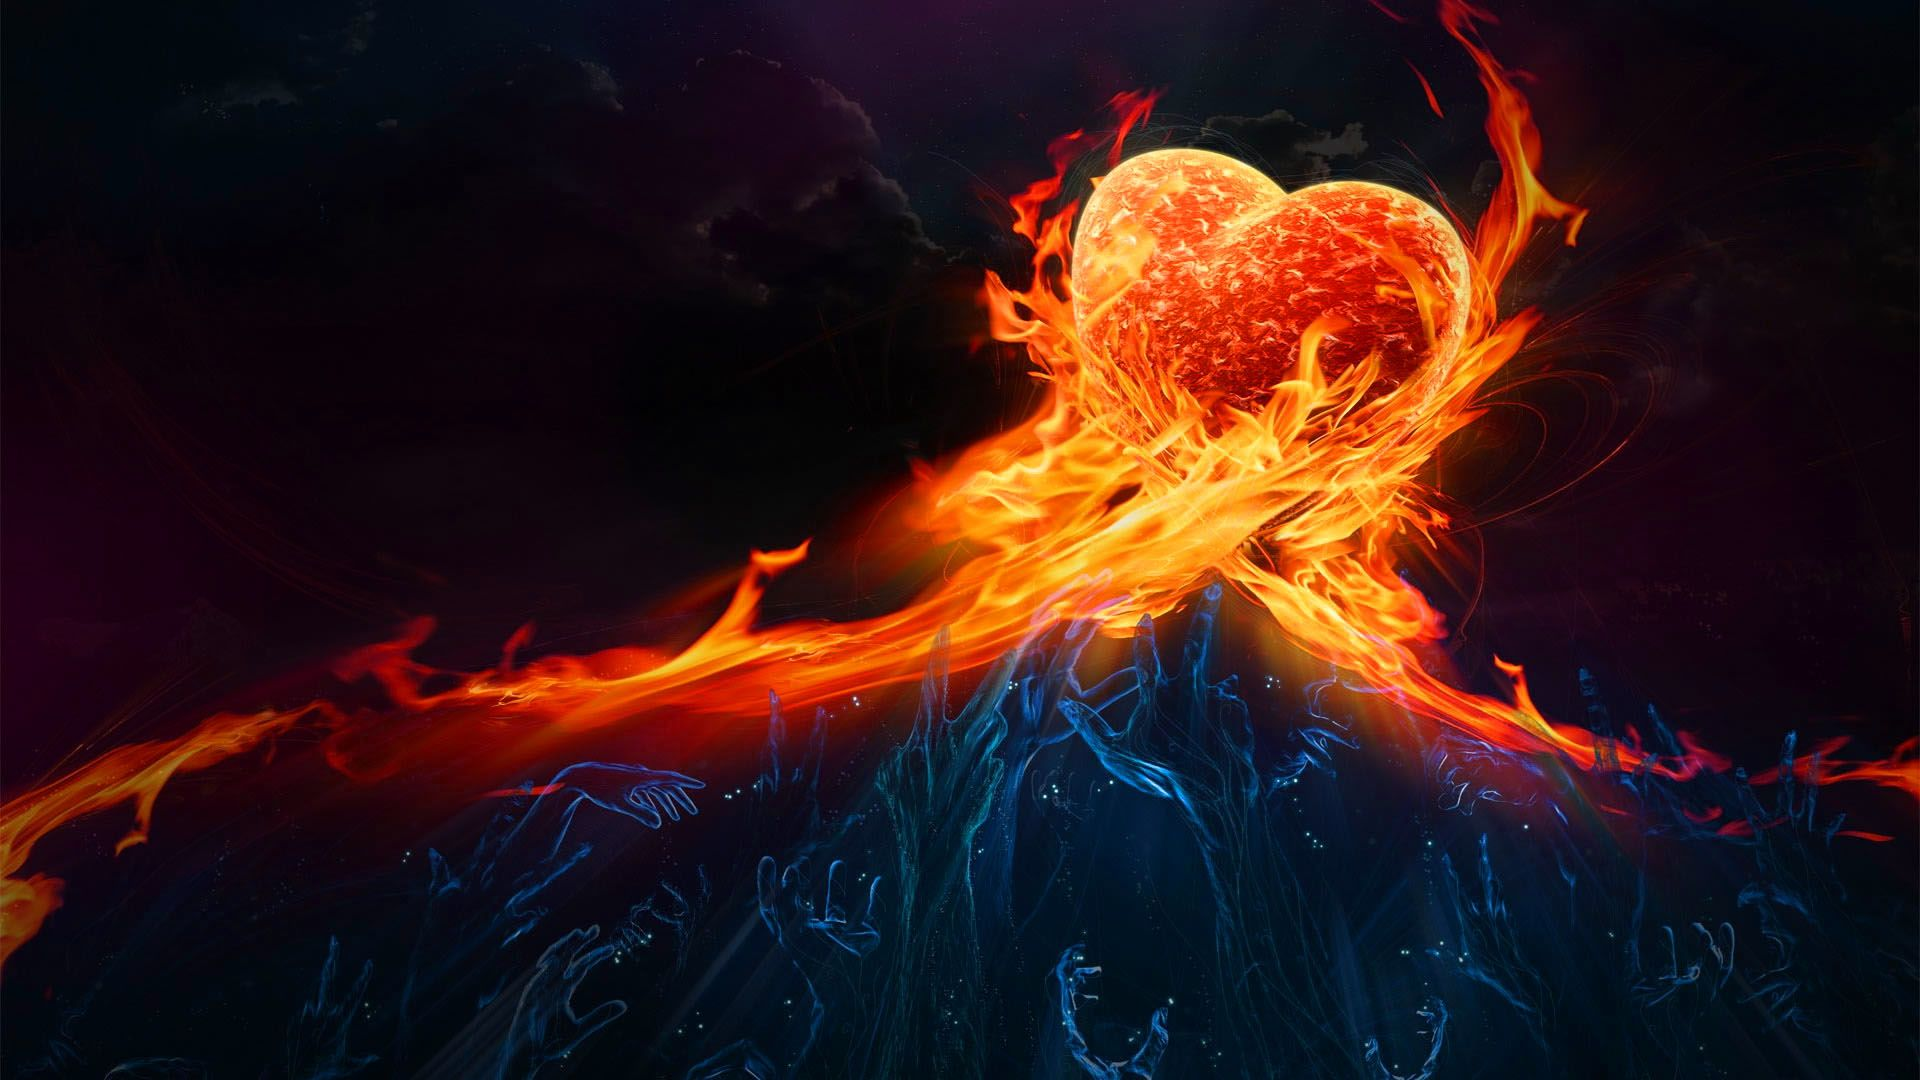 27+] Love Flame Wallpapers on WallpaperSafari